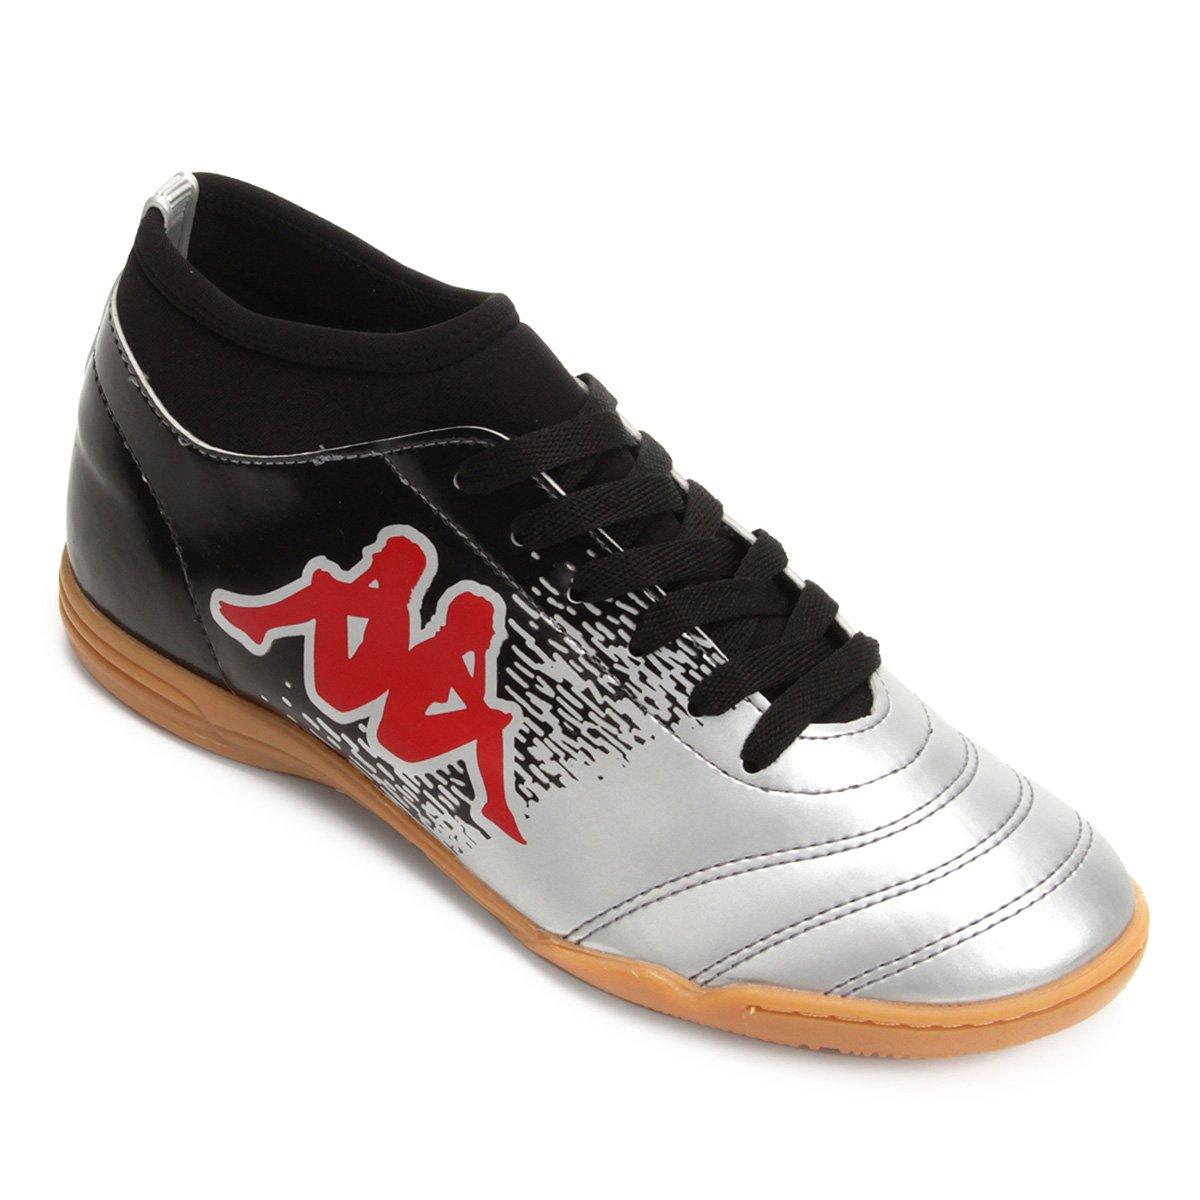 Chuteira Agility Futsal Kappa Agility Chuteira Masculina Compre Agora  Netsapatos 9cabd3 73a6bd1376af6